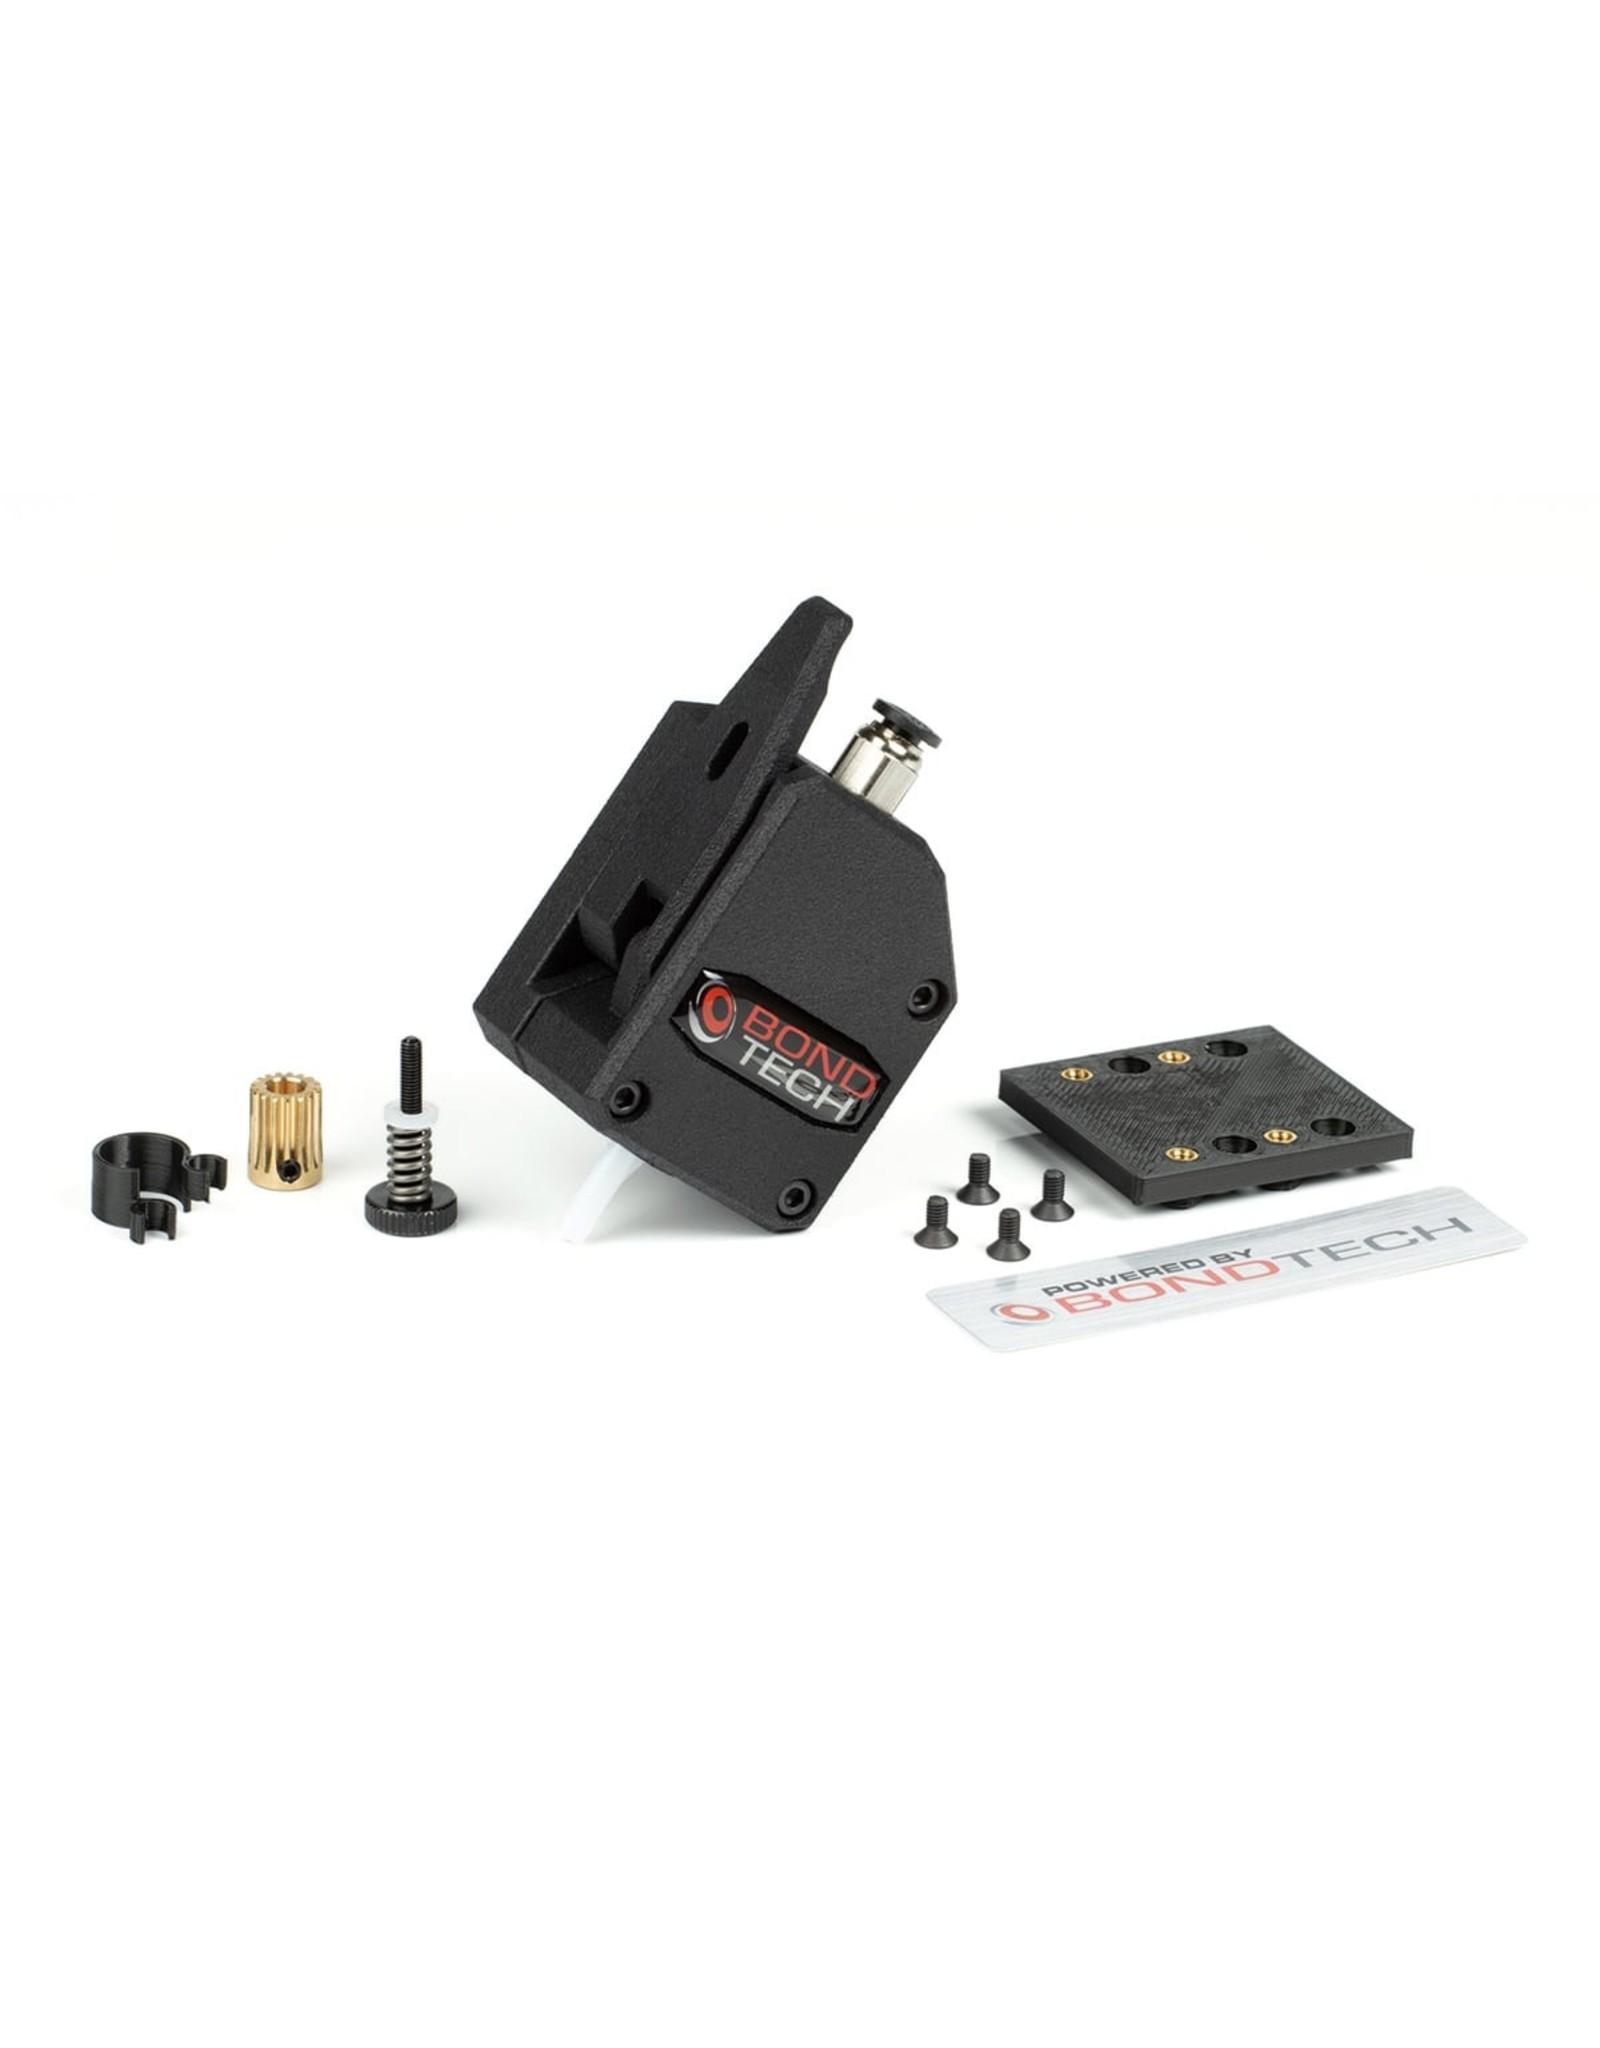 BONDTECH Bondtech Upgrade Kit For Creality3D CR-10S Pro with BMG extruder